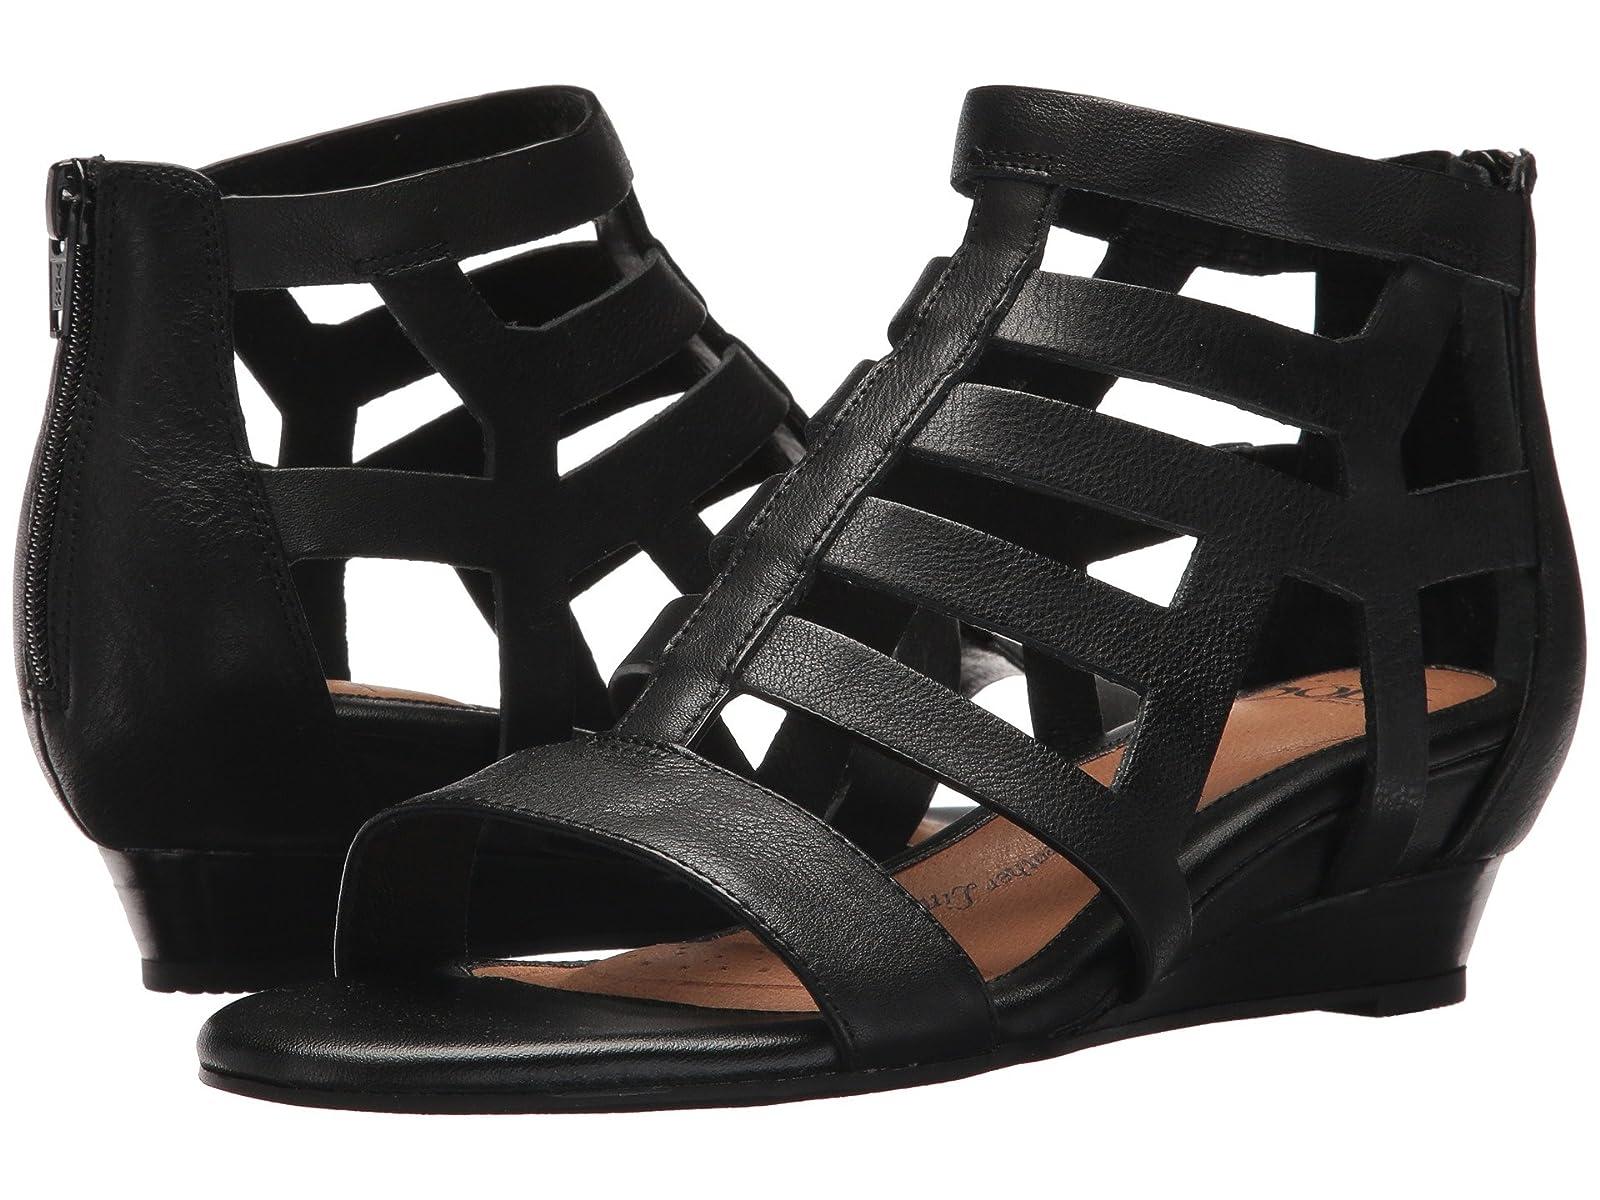 Sofft RavelloAtmospheric grades have affordable shoes